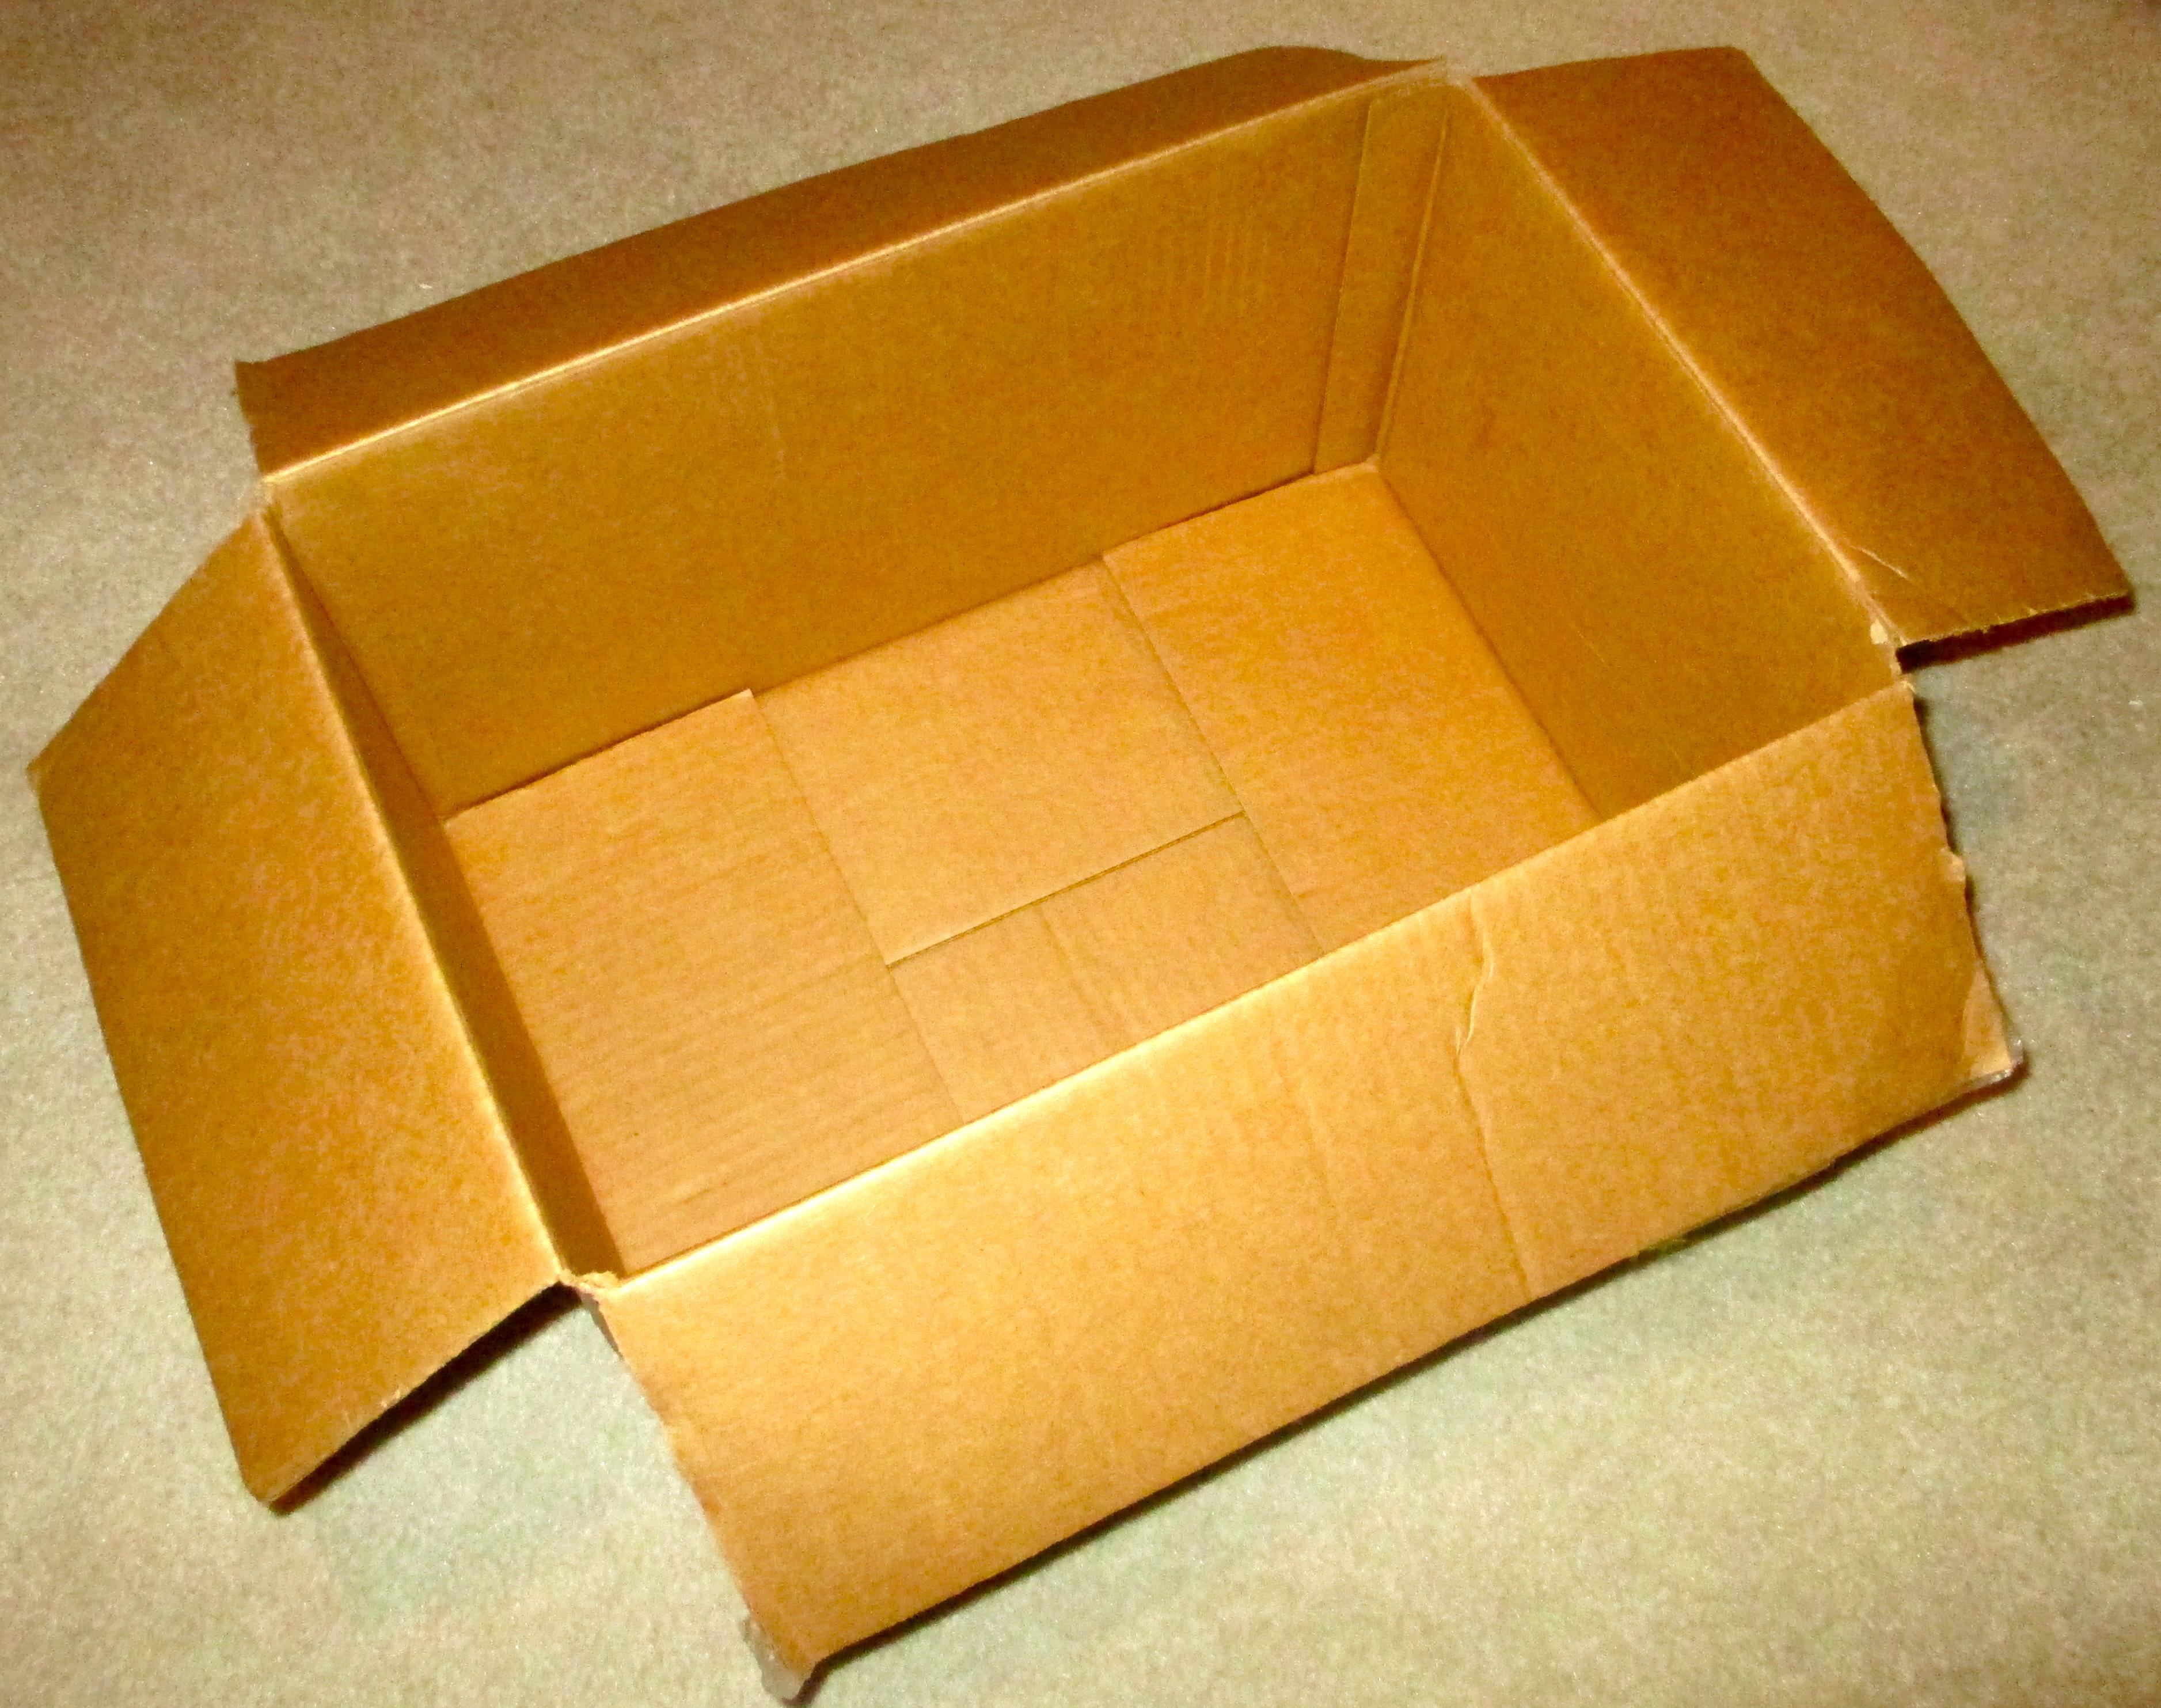 Picture of Find a Cardboard Box.